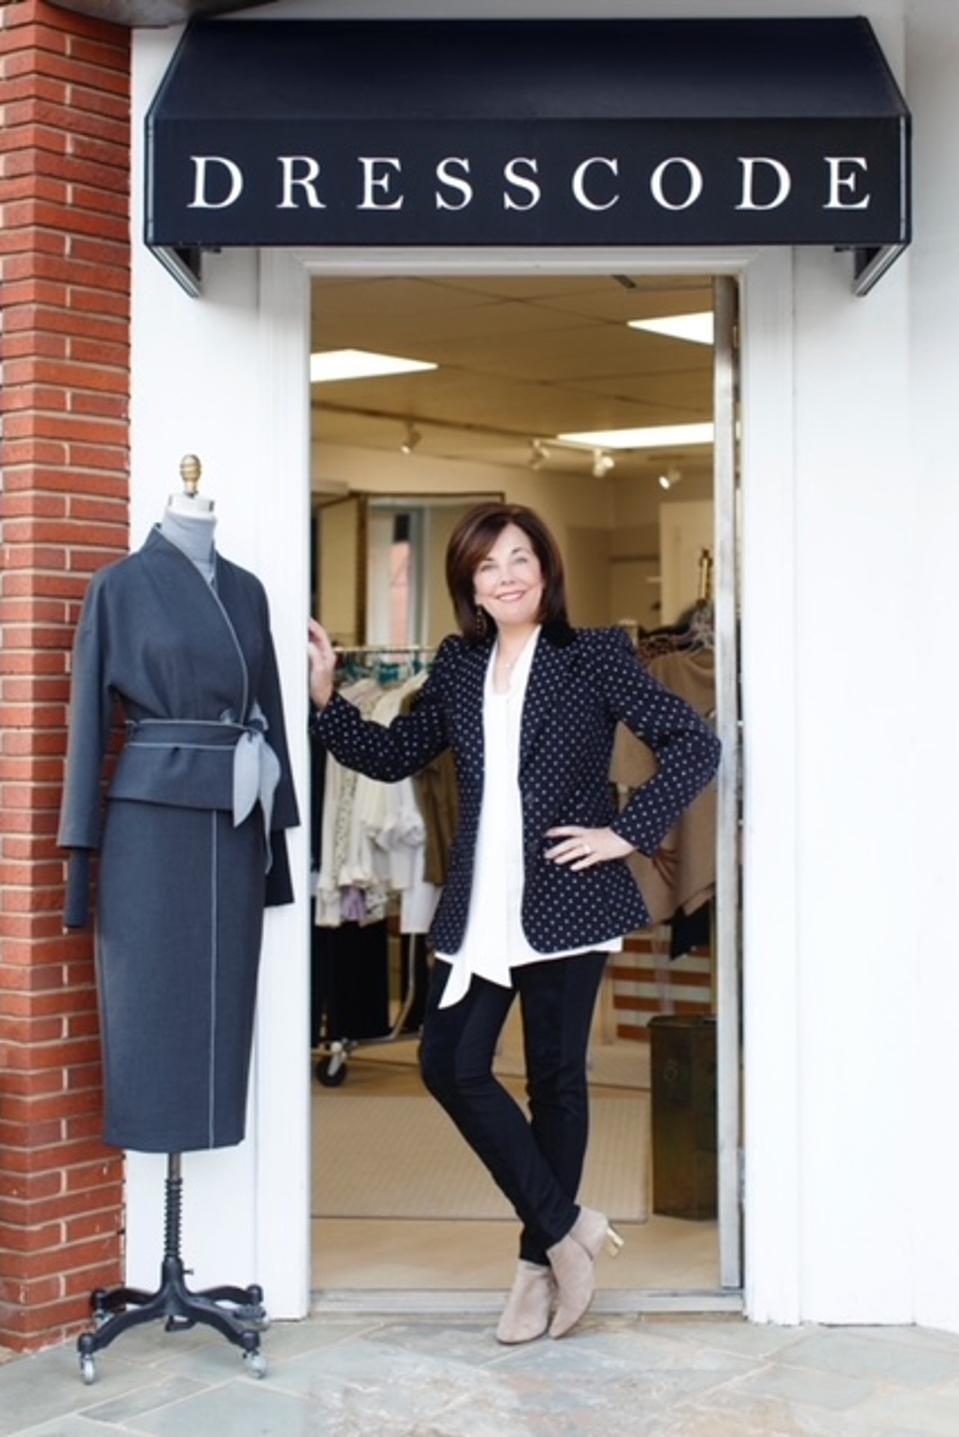 Maribeth Geraci, owner of Dress Code Style in Greensboro, NC